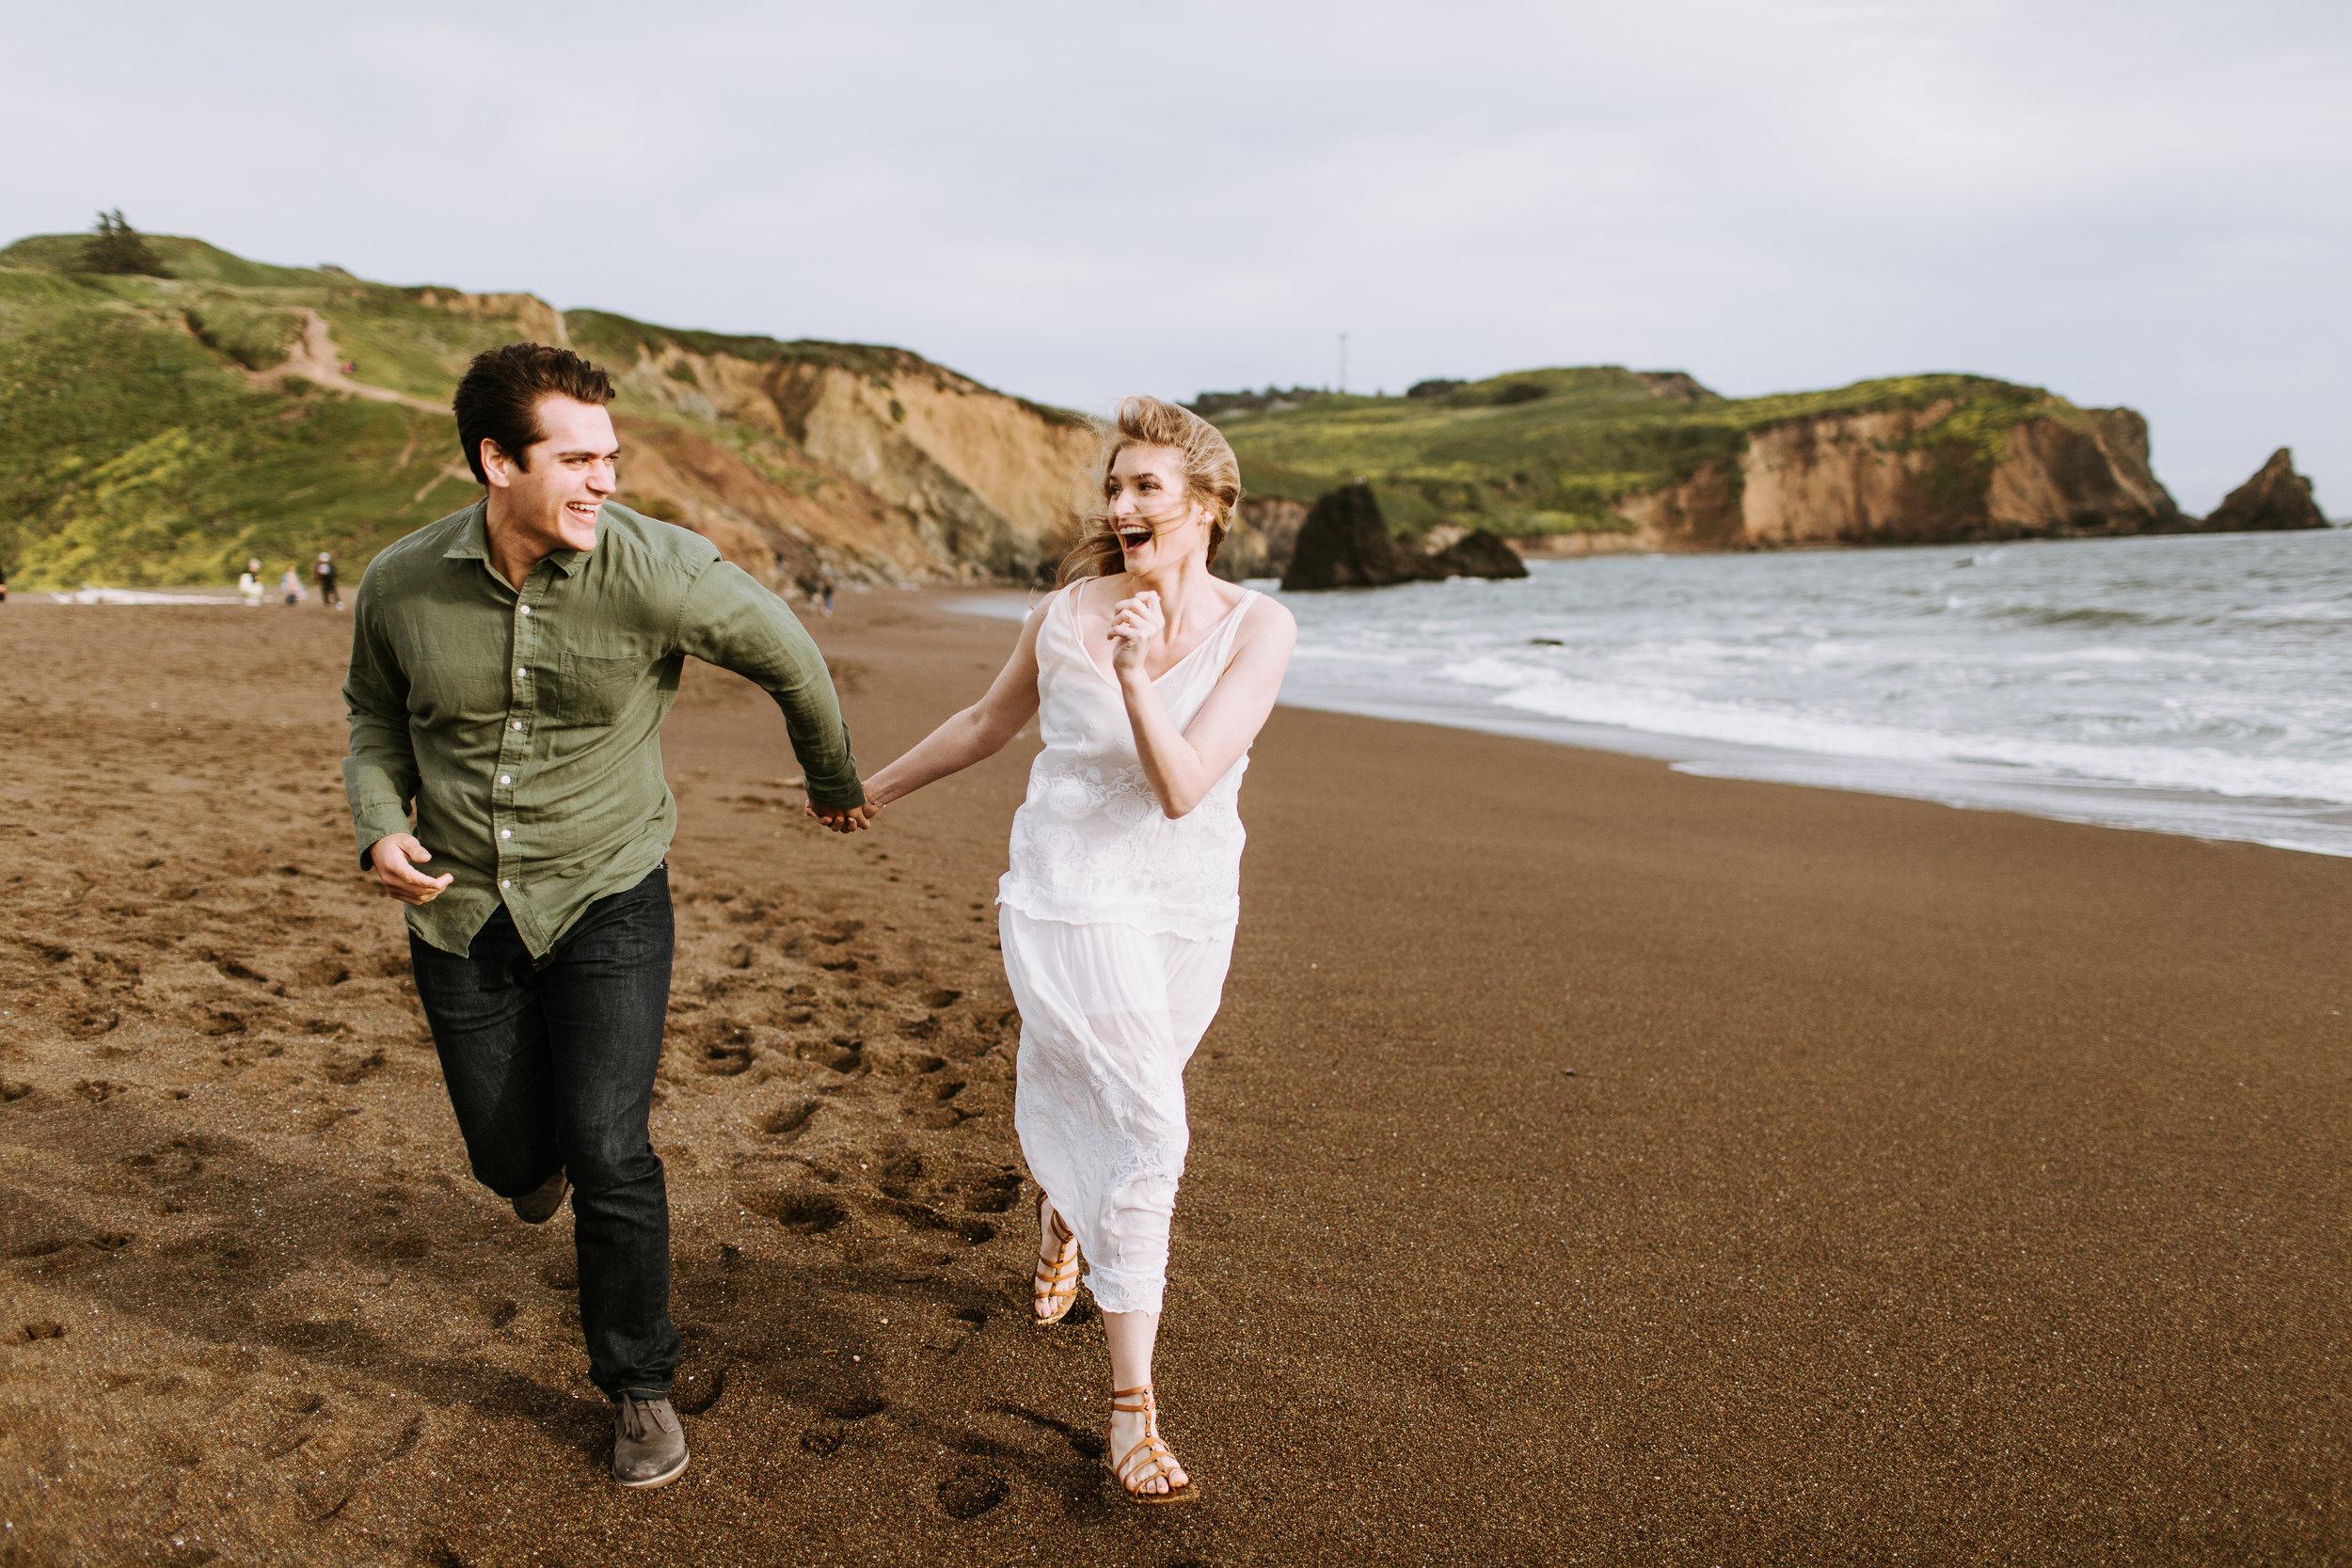 Paige&Garner-Engagements-2.jpg